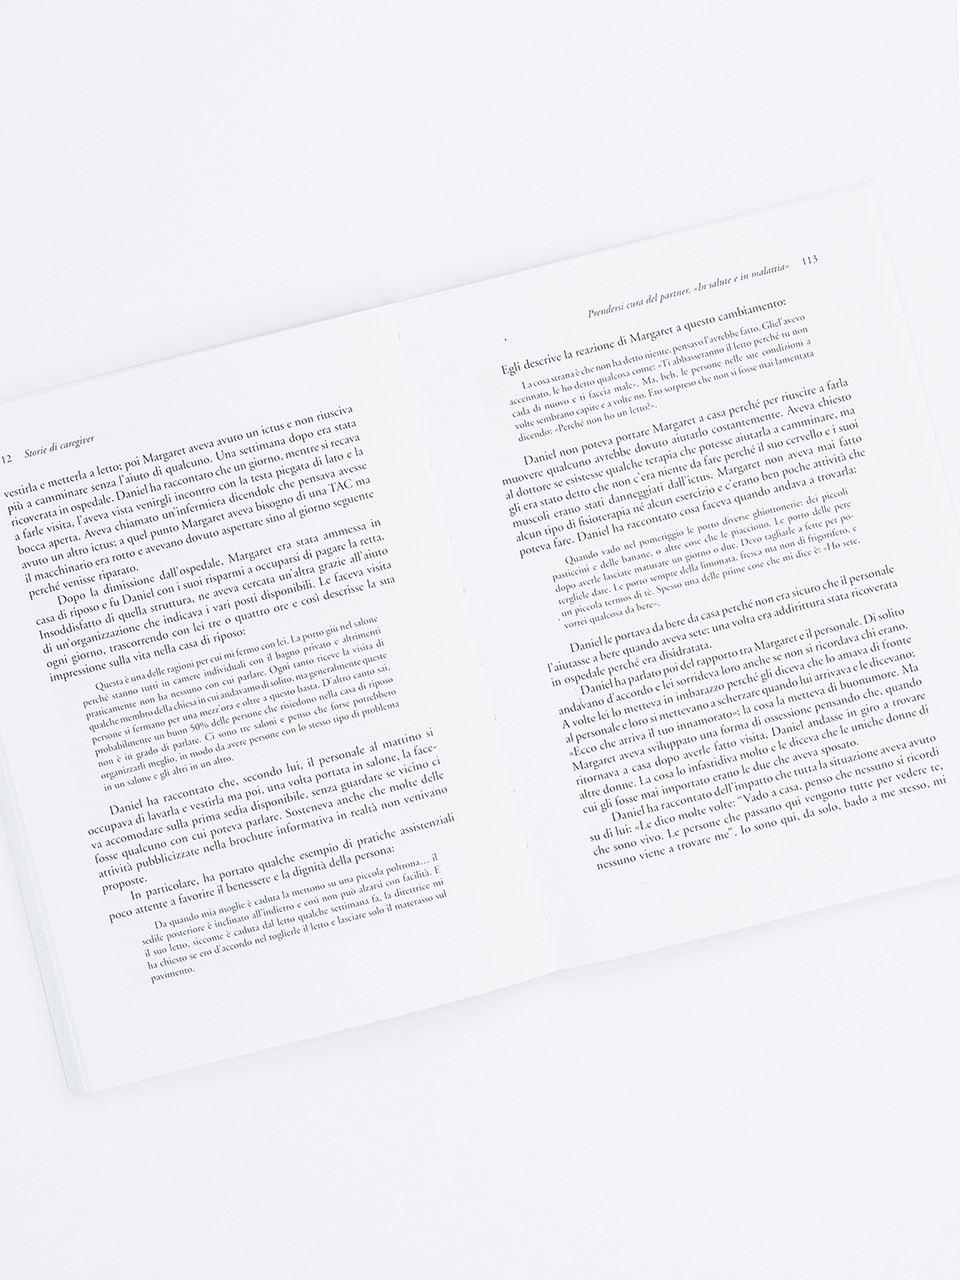 Storie di caregiver - Libri - Erickson 2